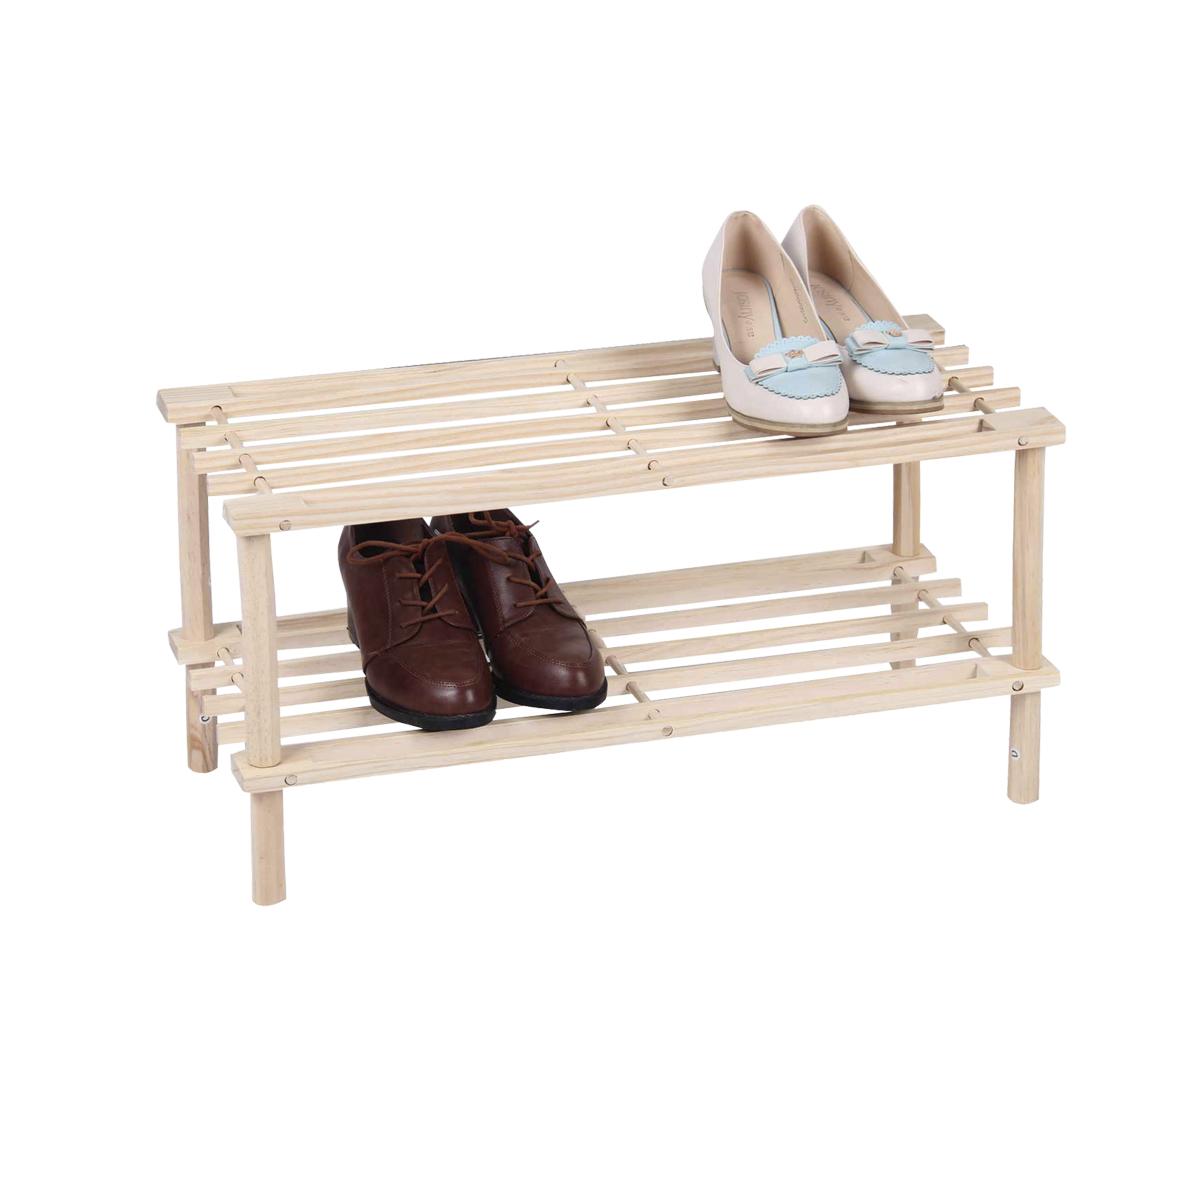 Полочка для обуви деревянная МД 2 уровня UC09994 разборная